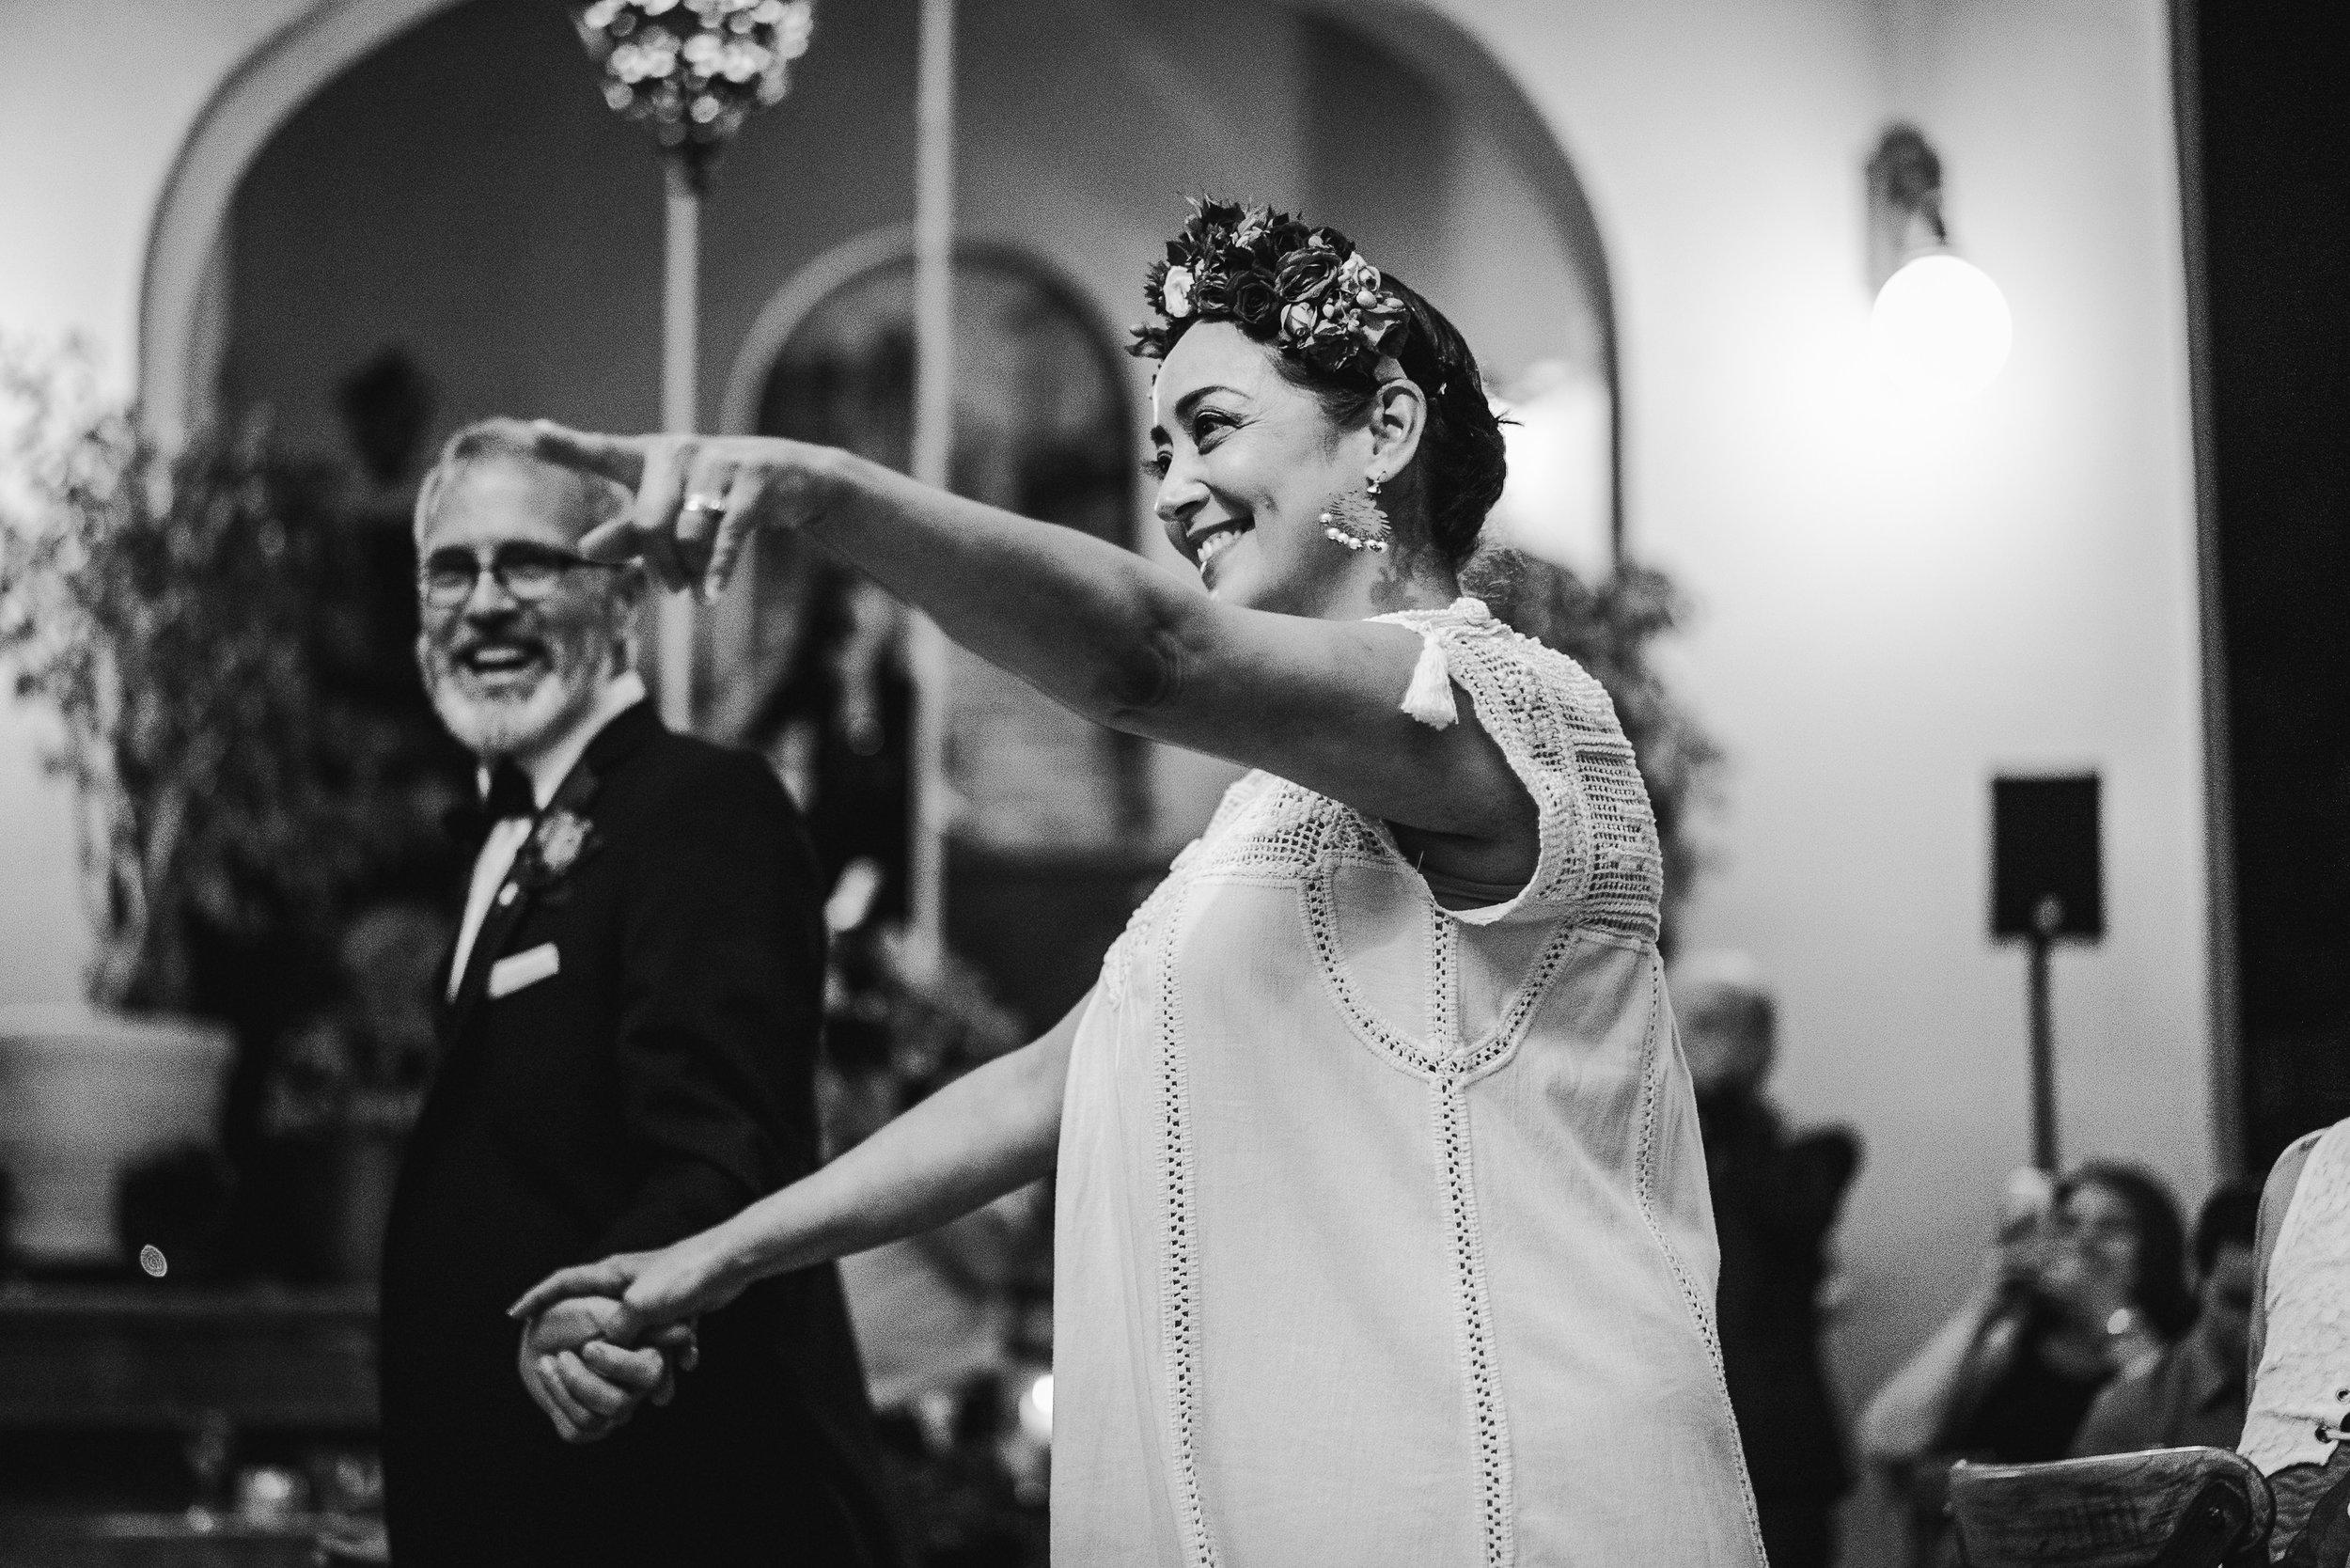 MaurizioSolisBroca-casa-carino-san-miguel-de-allende-wedding-87.jpg